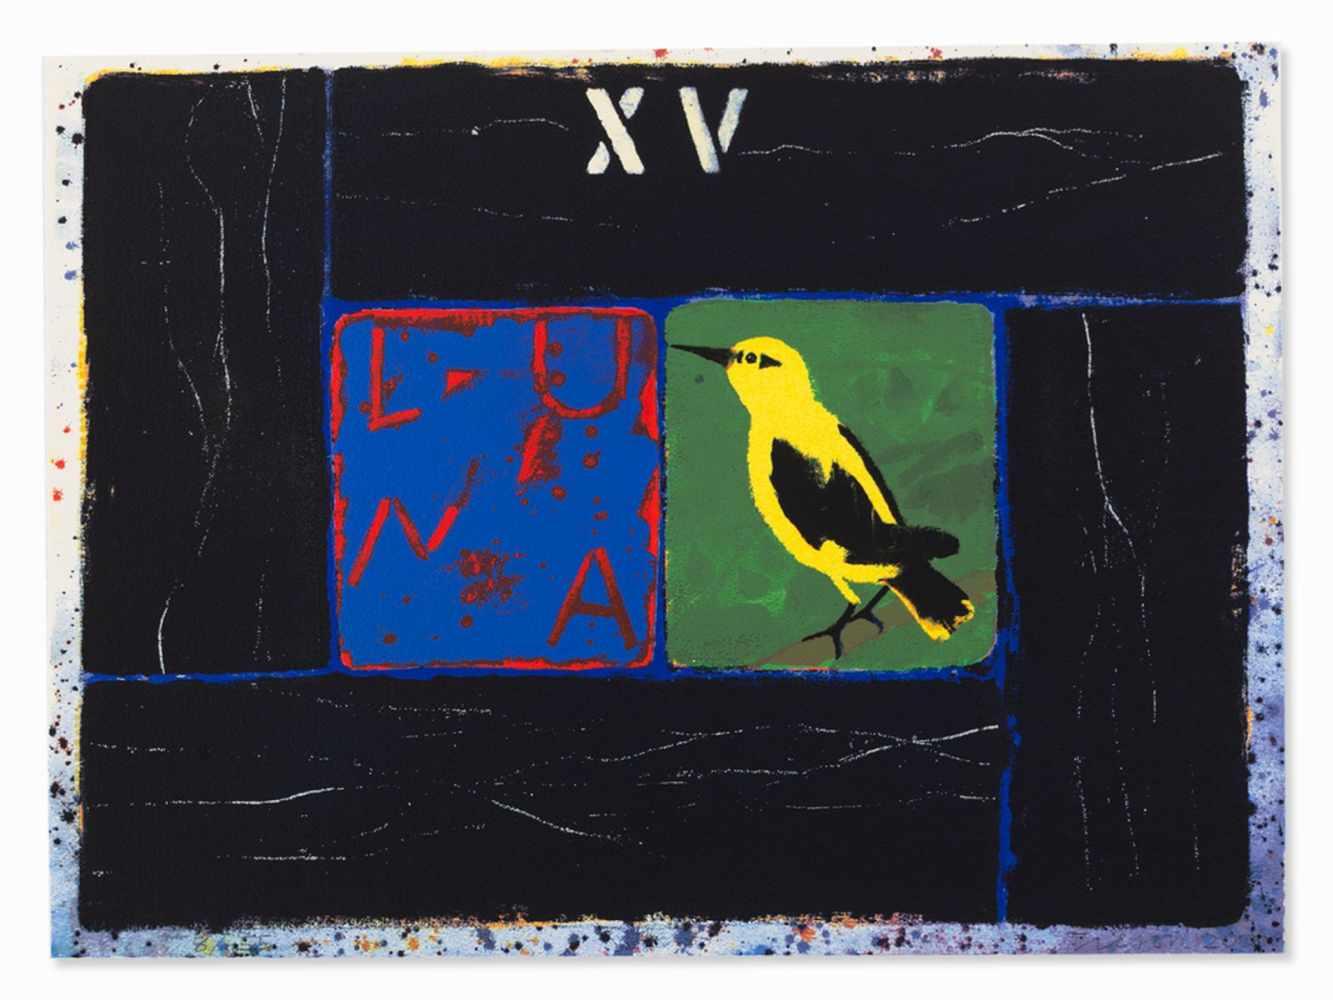 Joe Tilson, Conjunctions, 3 Serigraphs in Colors, 2001 - Image 6 of 7